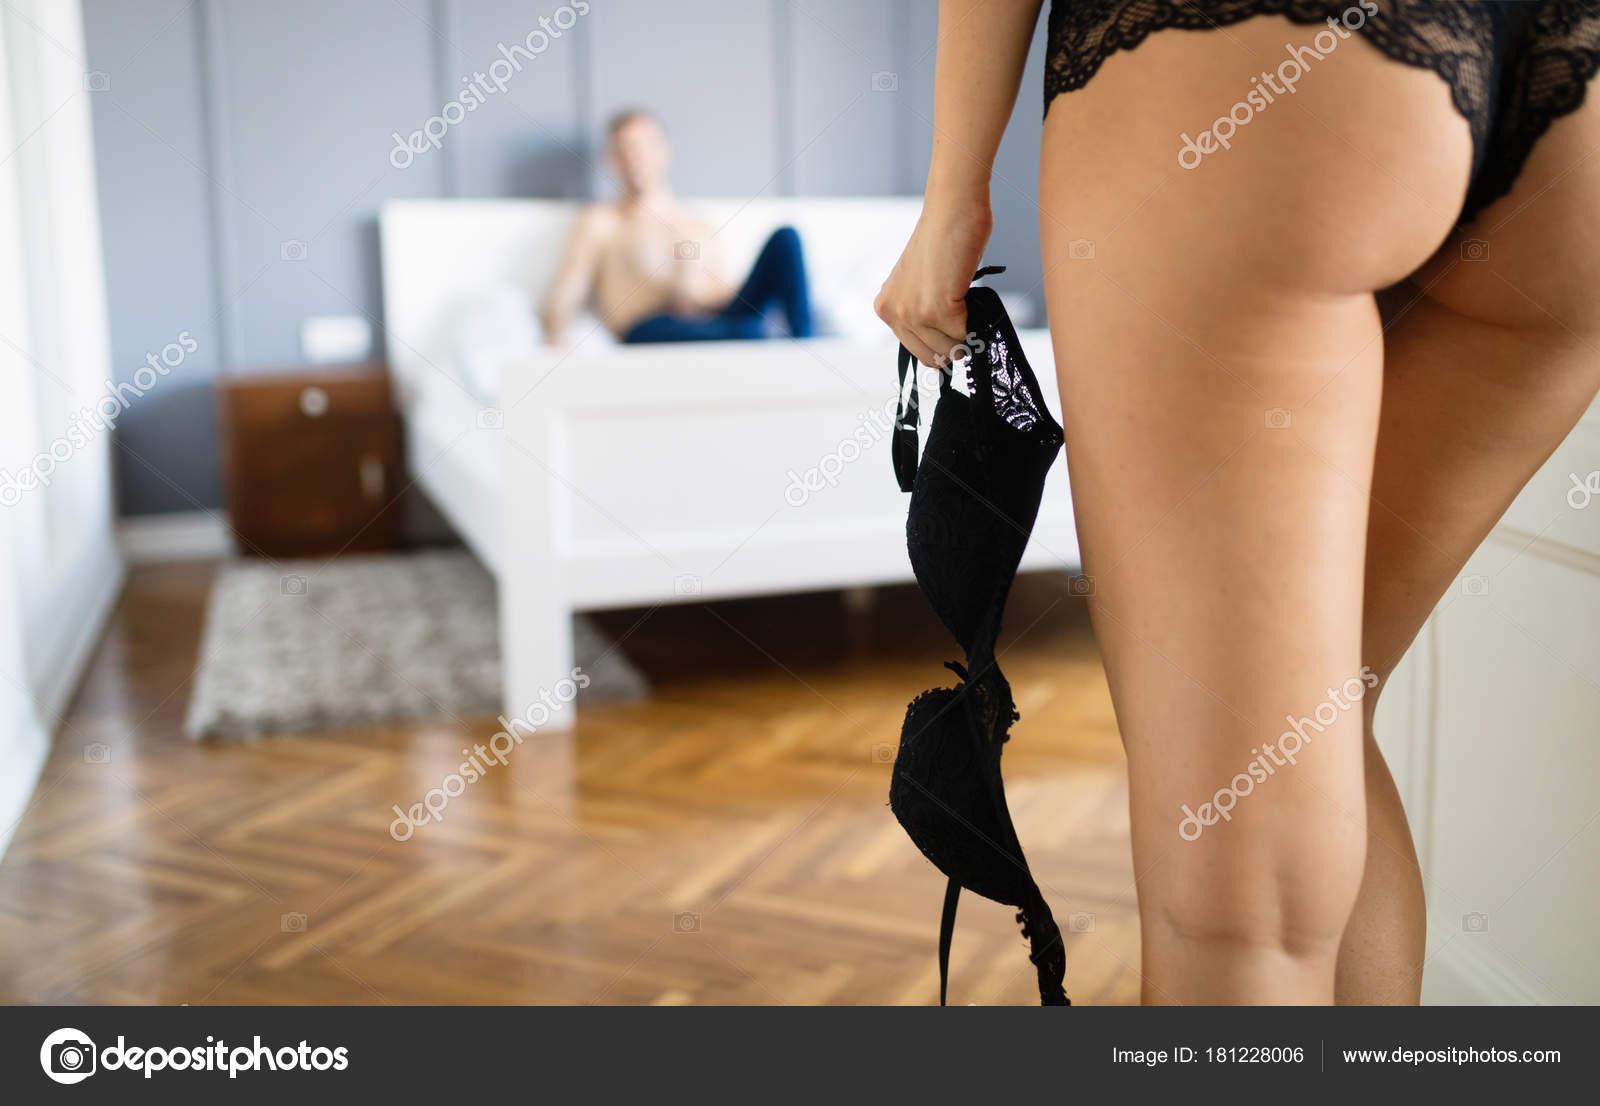 Hotwife sex pics